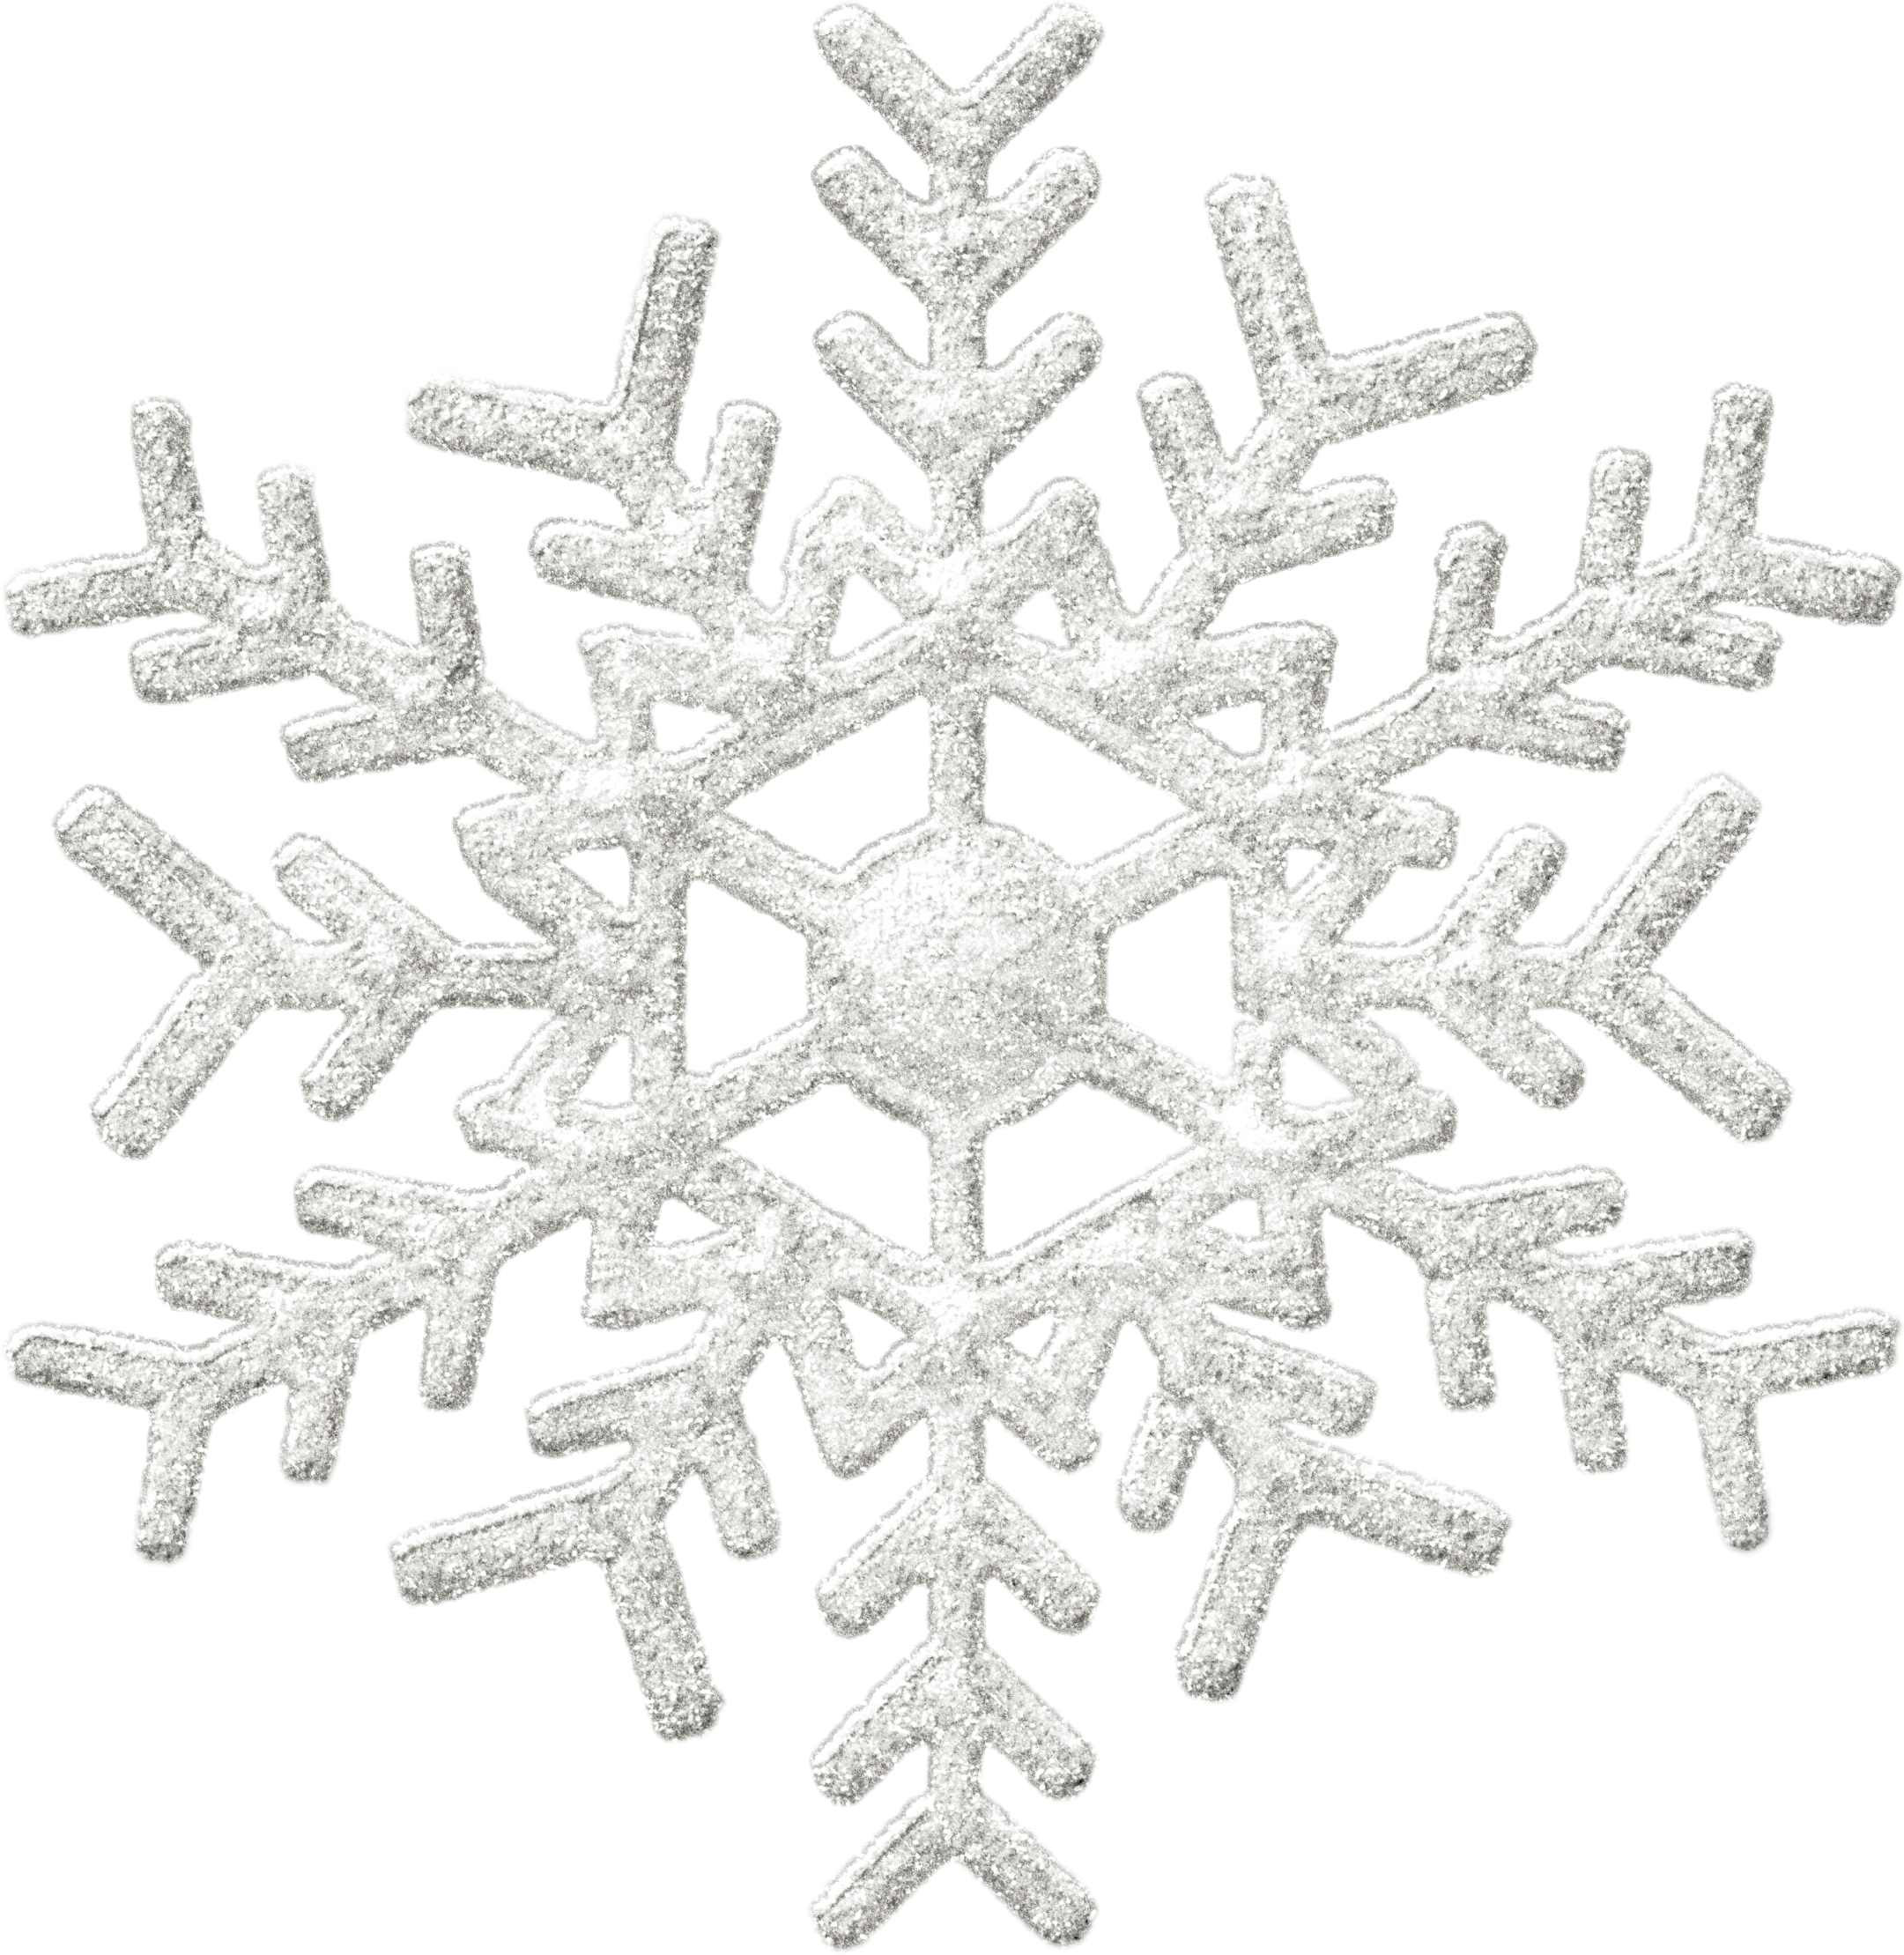 Snowflakes PNG Image Снежинки, Снег, Картинки